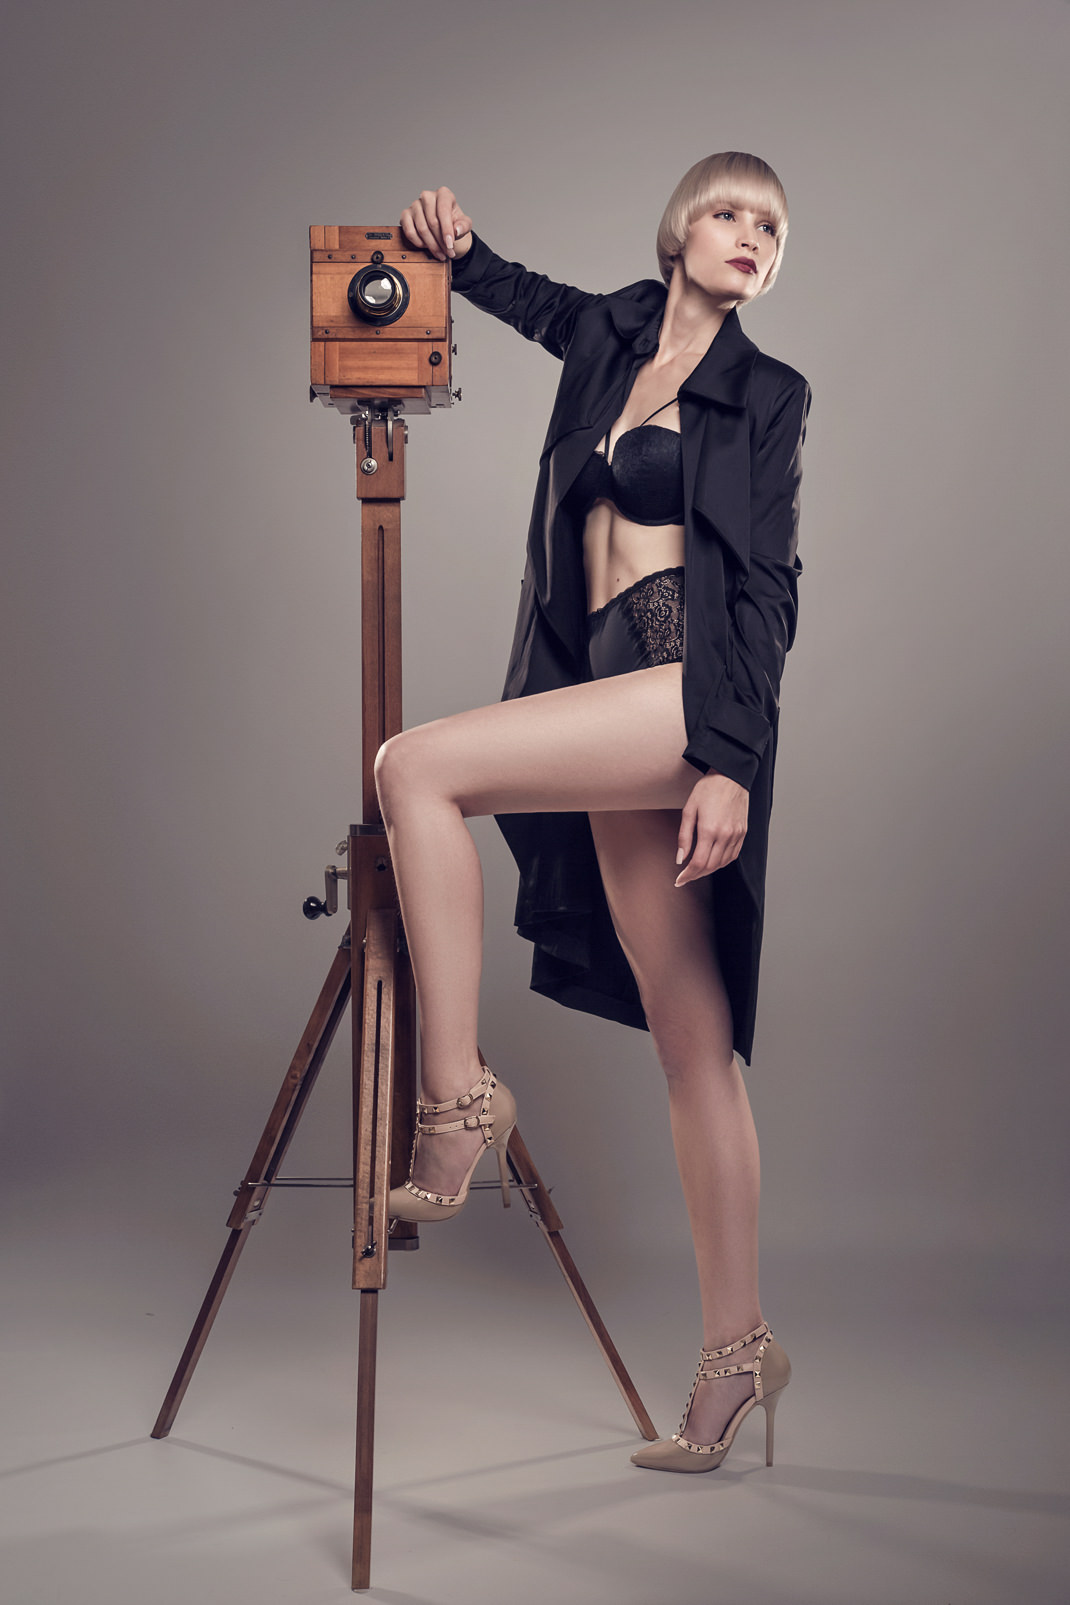 Two Beauties - Jane & Dr. Höhn & Co Tropical Camera - Markus Hertzsch - Camera - Girl